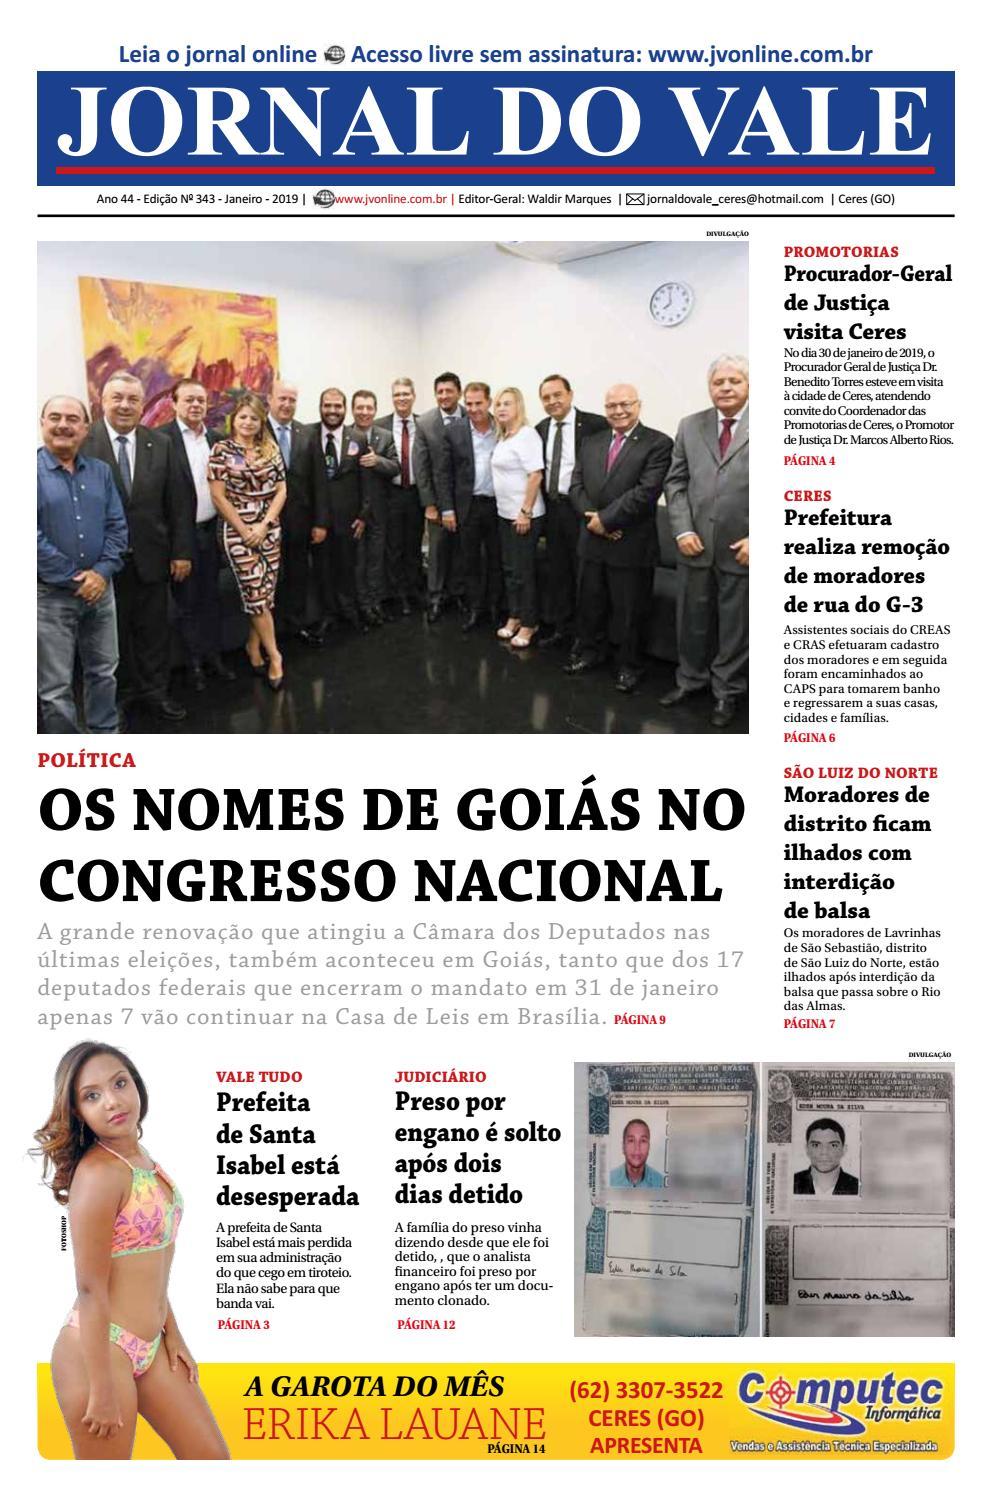 0a4cd4ccc2 Jornal do Vale - Edição 343 - Janeiro 2019 by jornal do vale - issuu